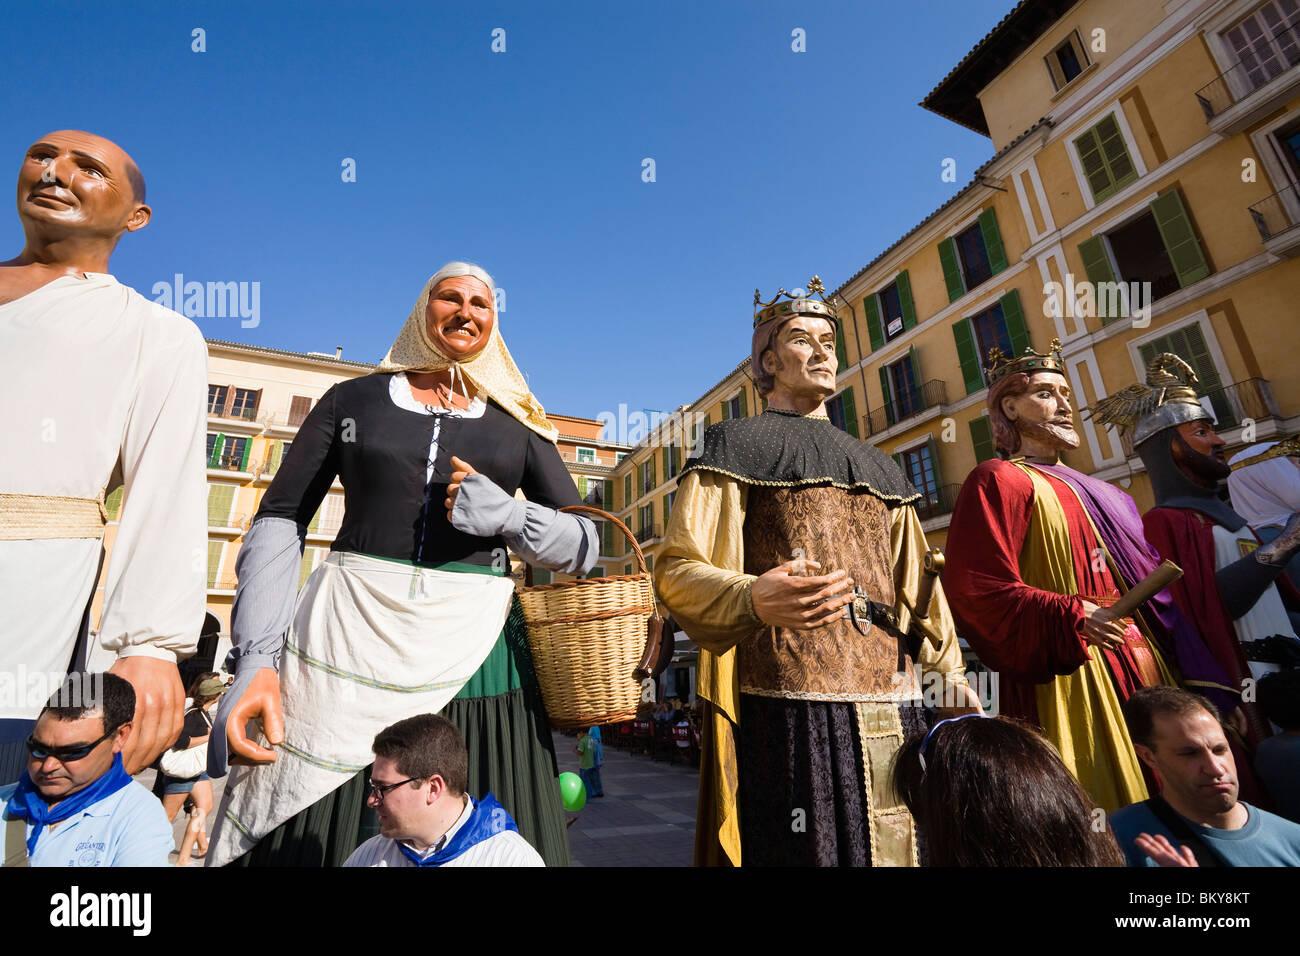 Traditional figures at a square, Diada per la Llengua, Placa Major, Palma, Mallorca, Spain, Europe - Stock Image